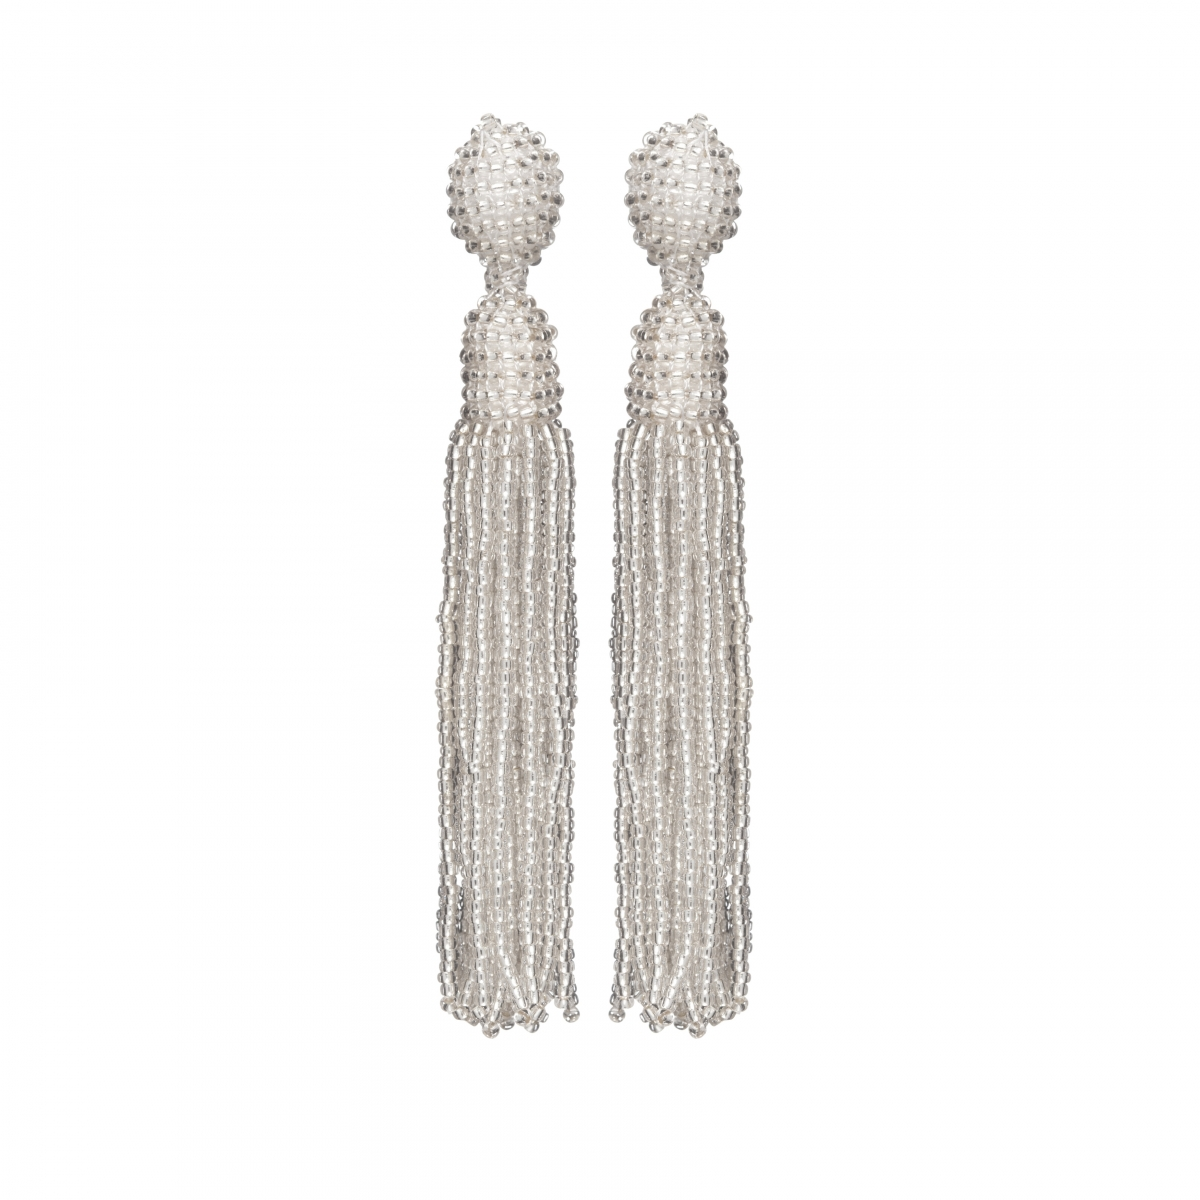 Náušnice Bette White Crystal Beads